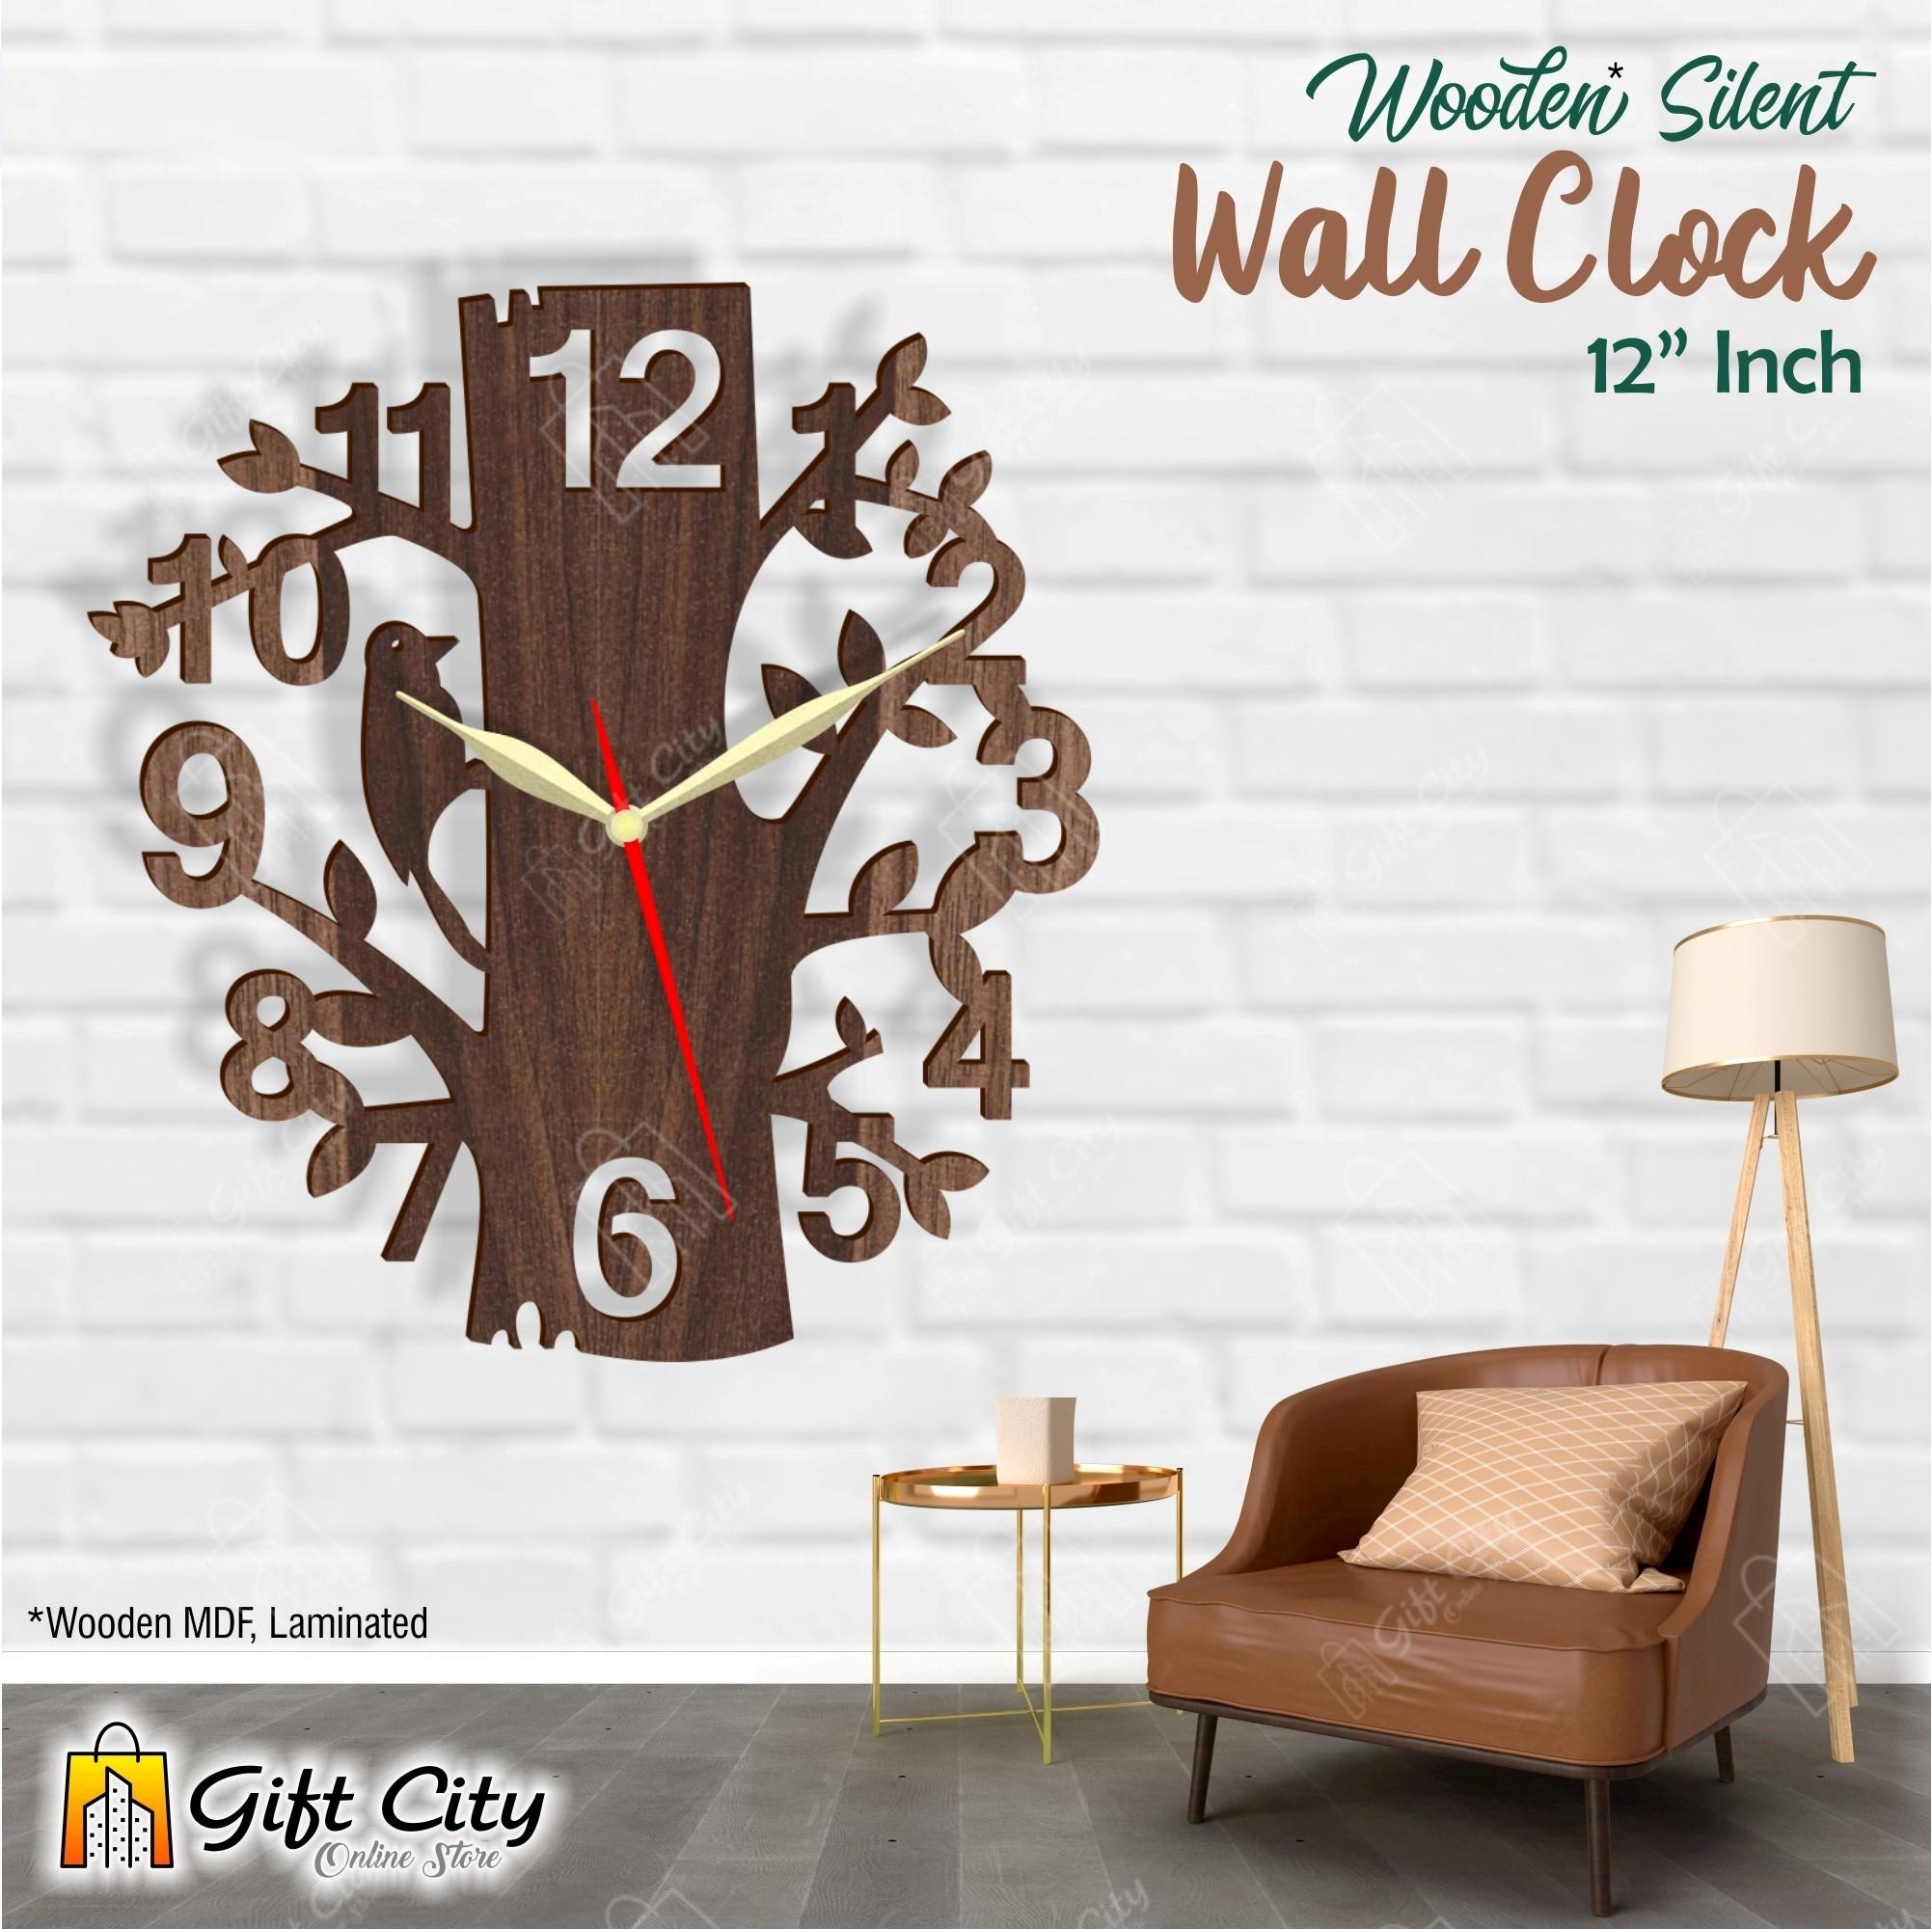 Woodpecker 3D Silent Wooden / Acrylic Wall Clock - Home & Office Decor - Laser Cut - GIFT City